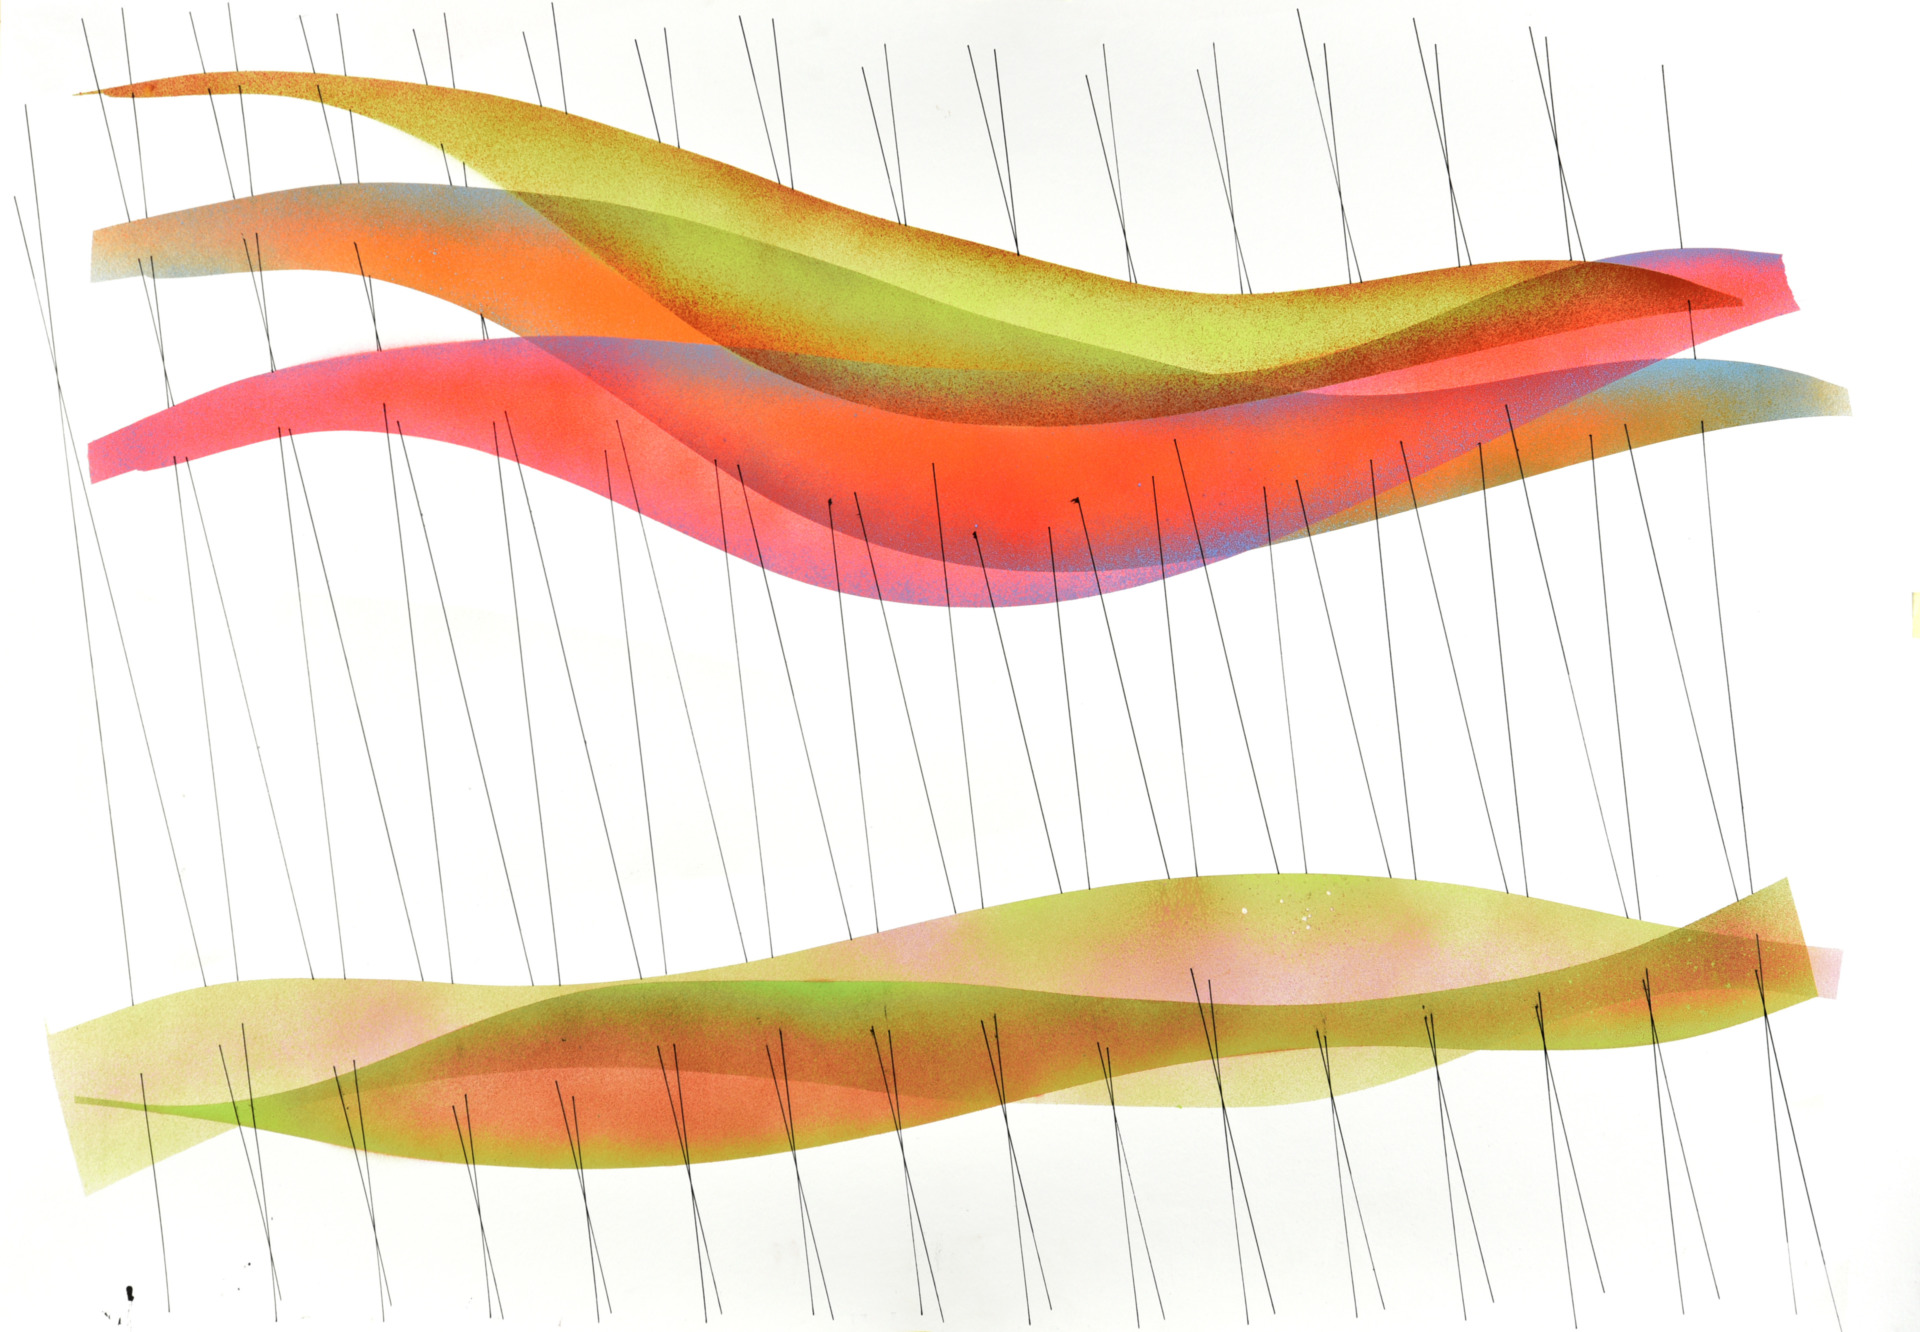 Op. 120120. acrylic on paper, 75 x 105cm, 2020